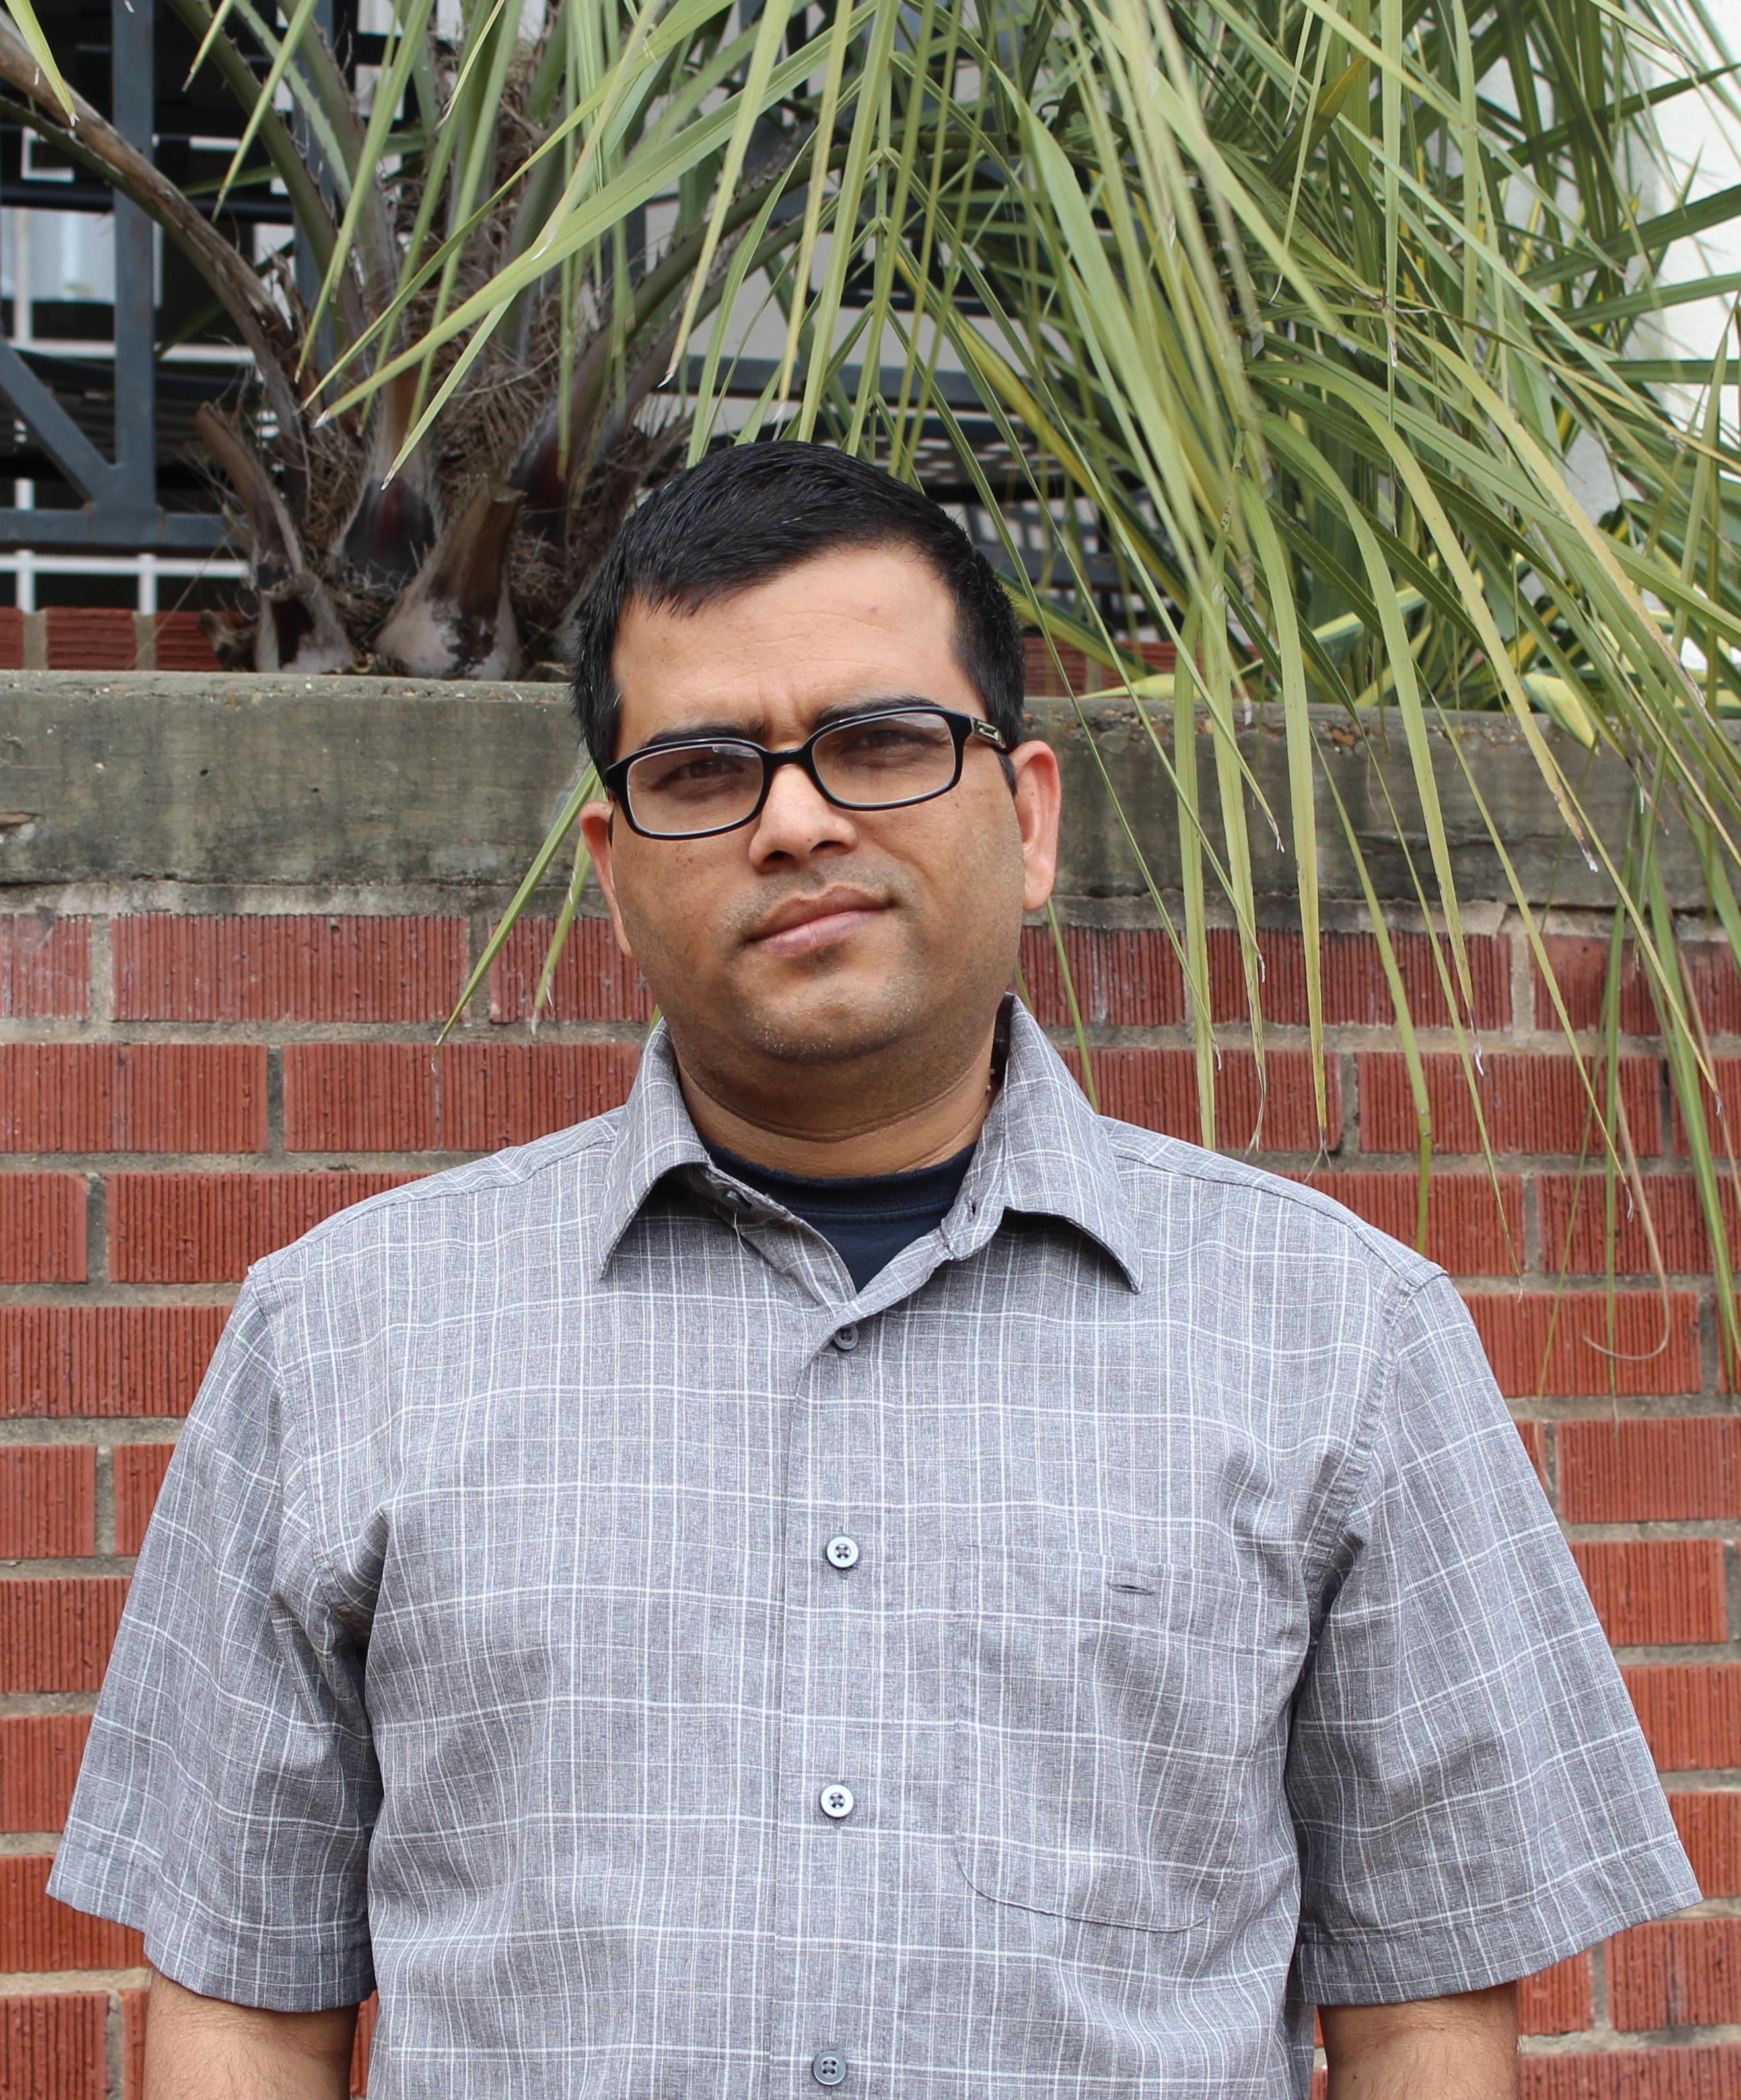 Dr. Thir Dangal, Assistant Professor